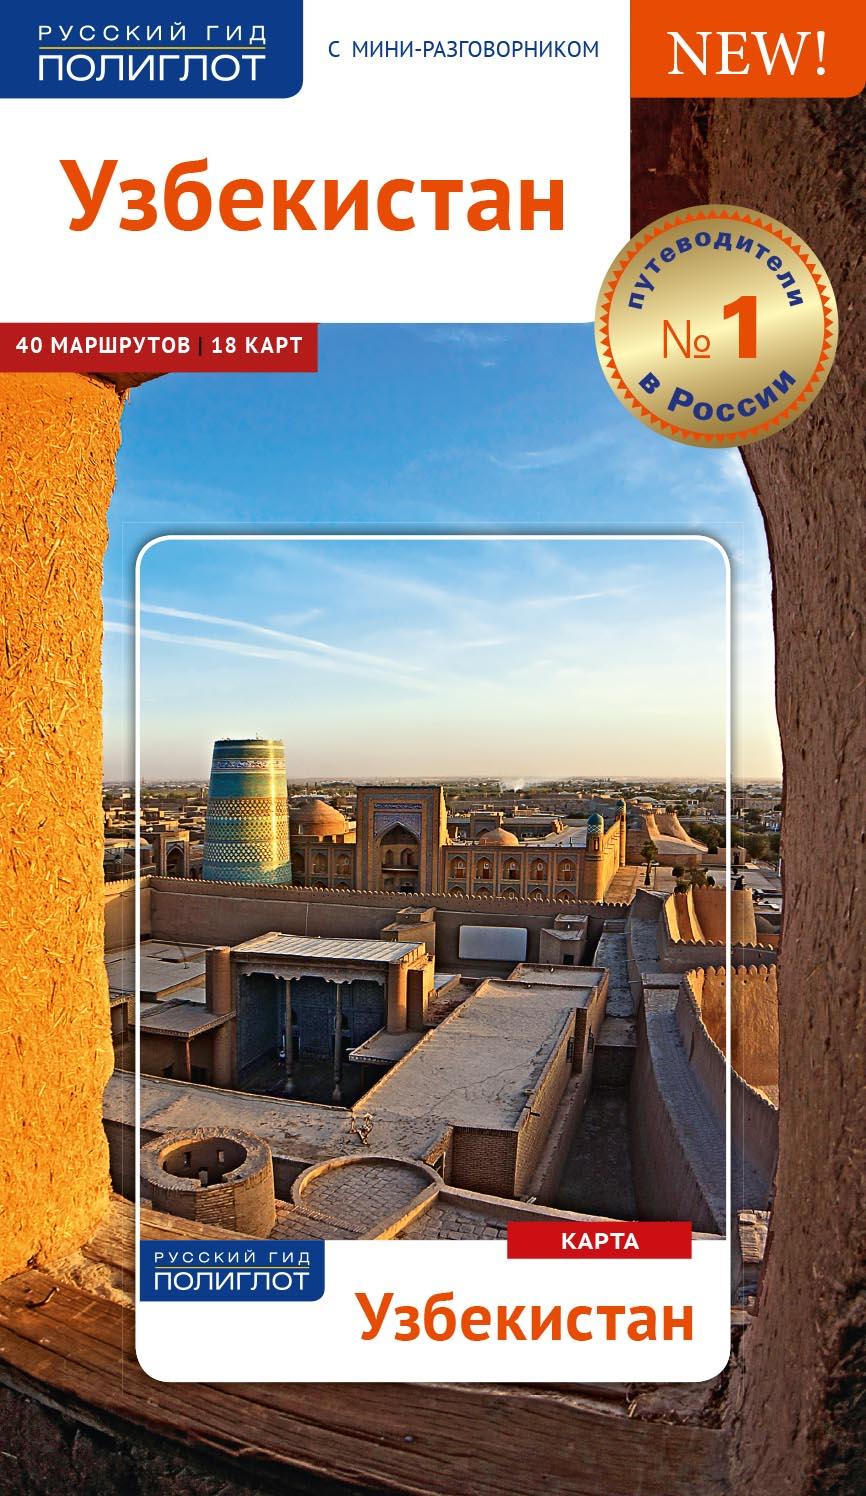 Узбекистан: Путеводитель с мини-разговорником: 40 маршрутов, 18 карт